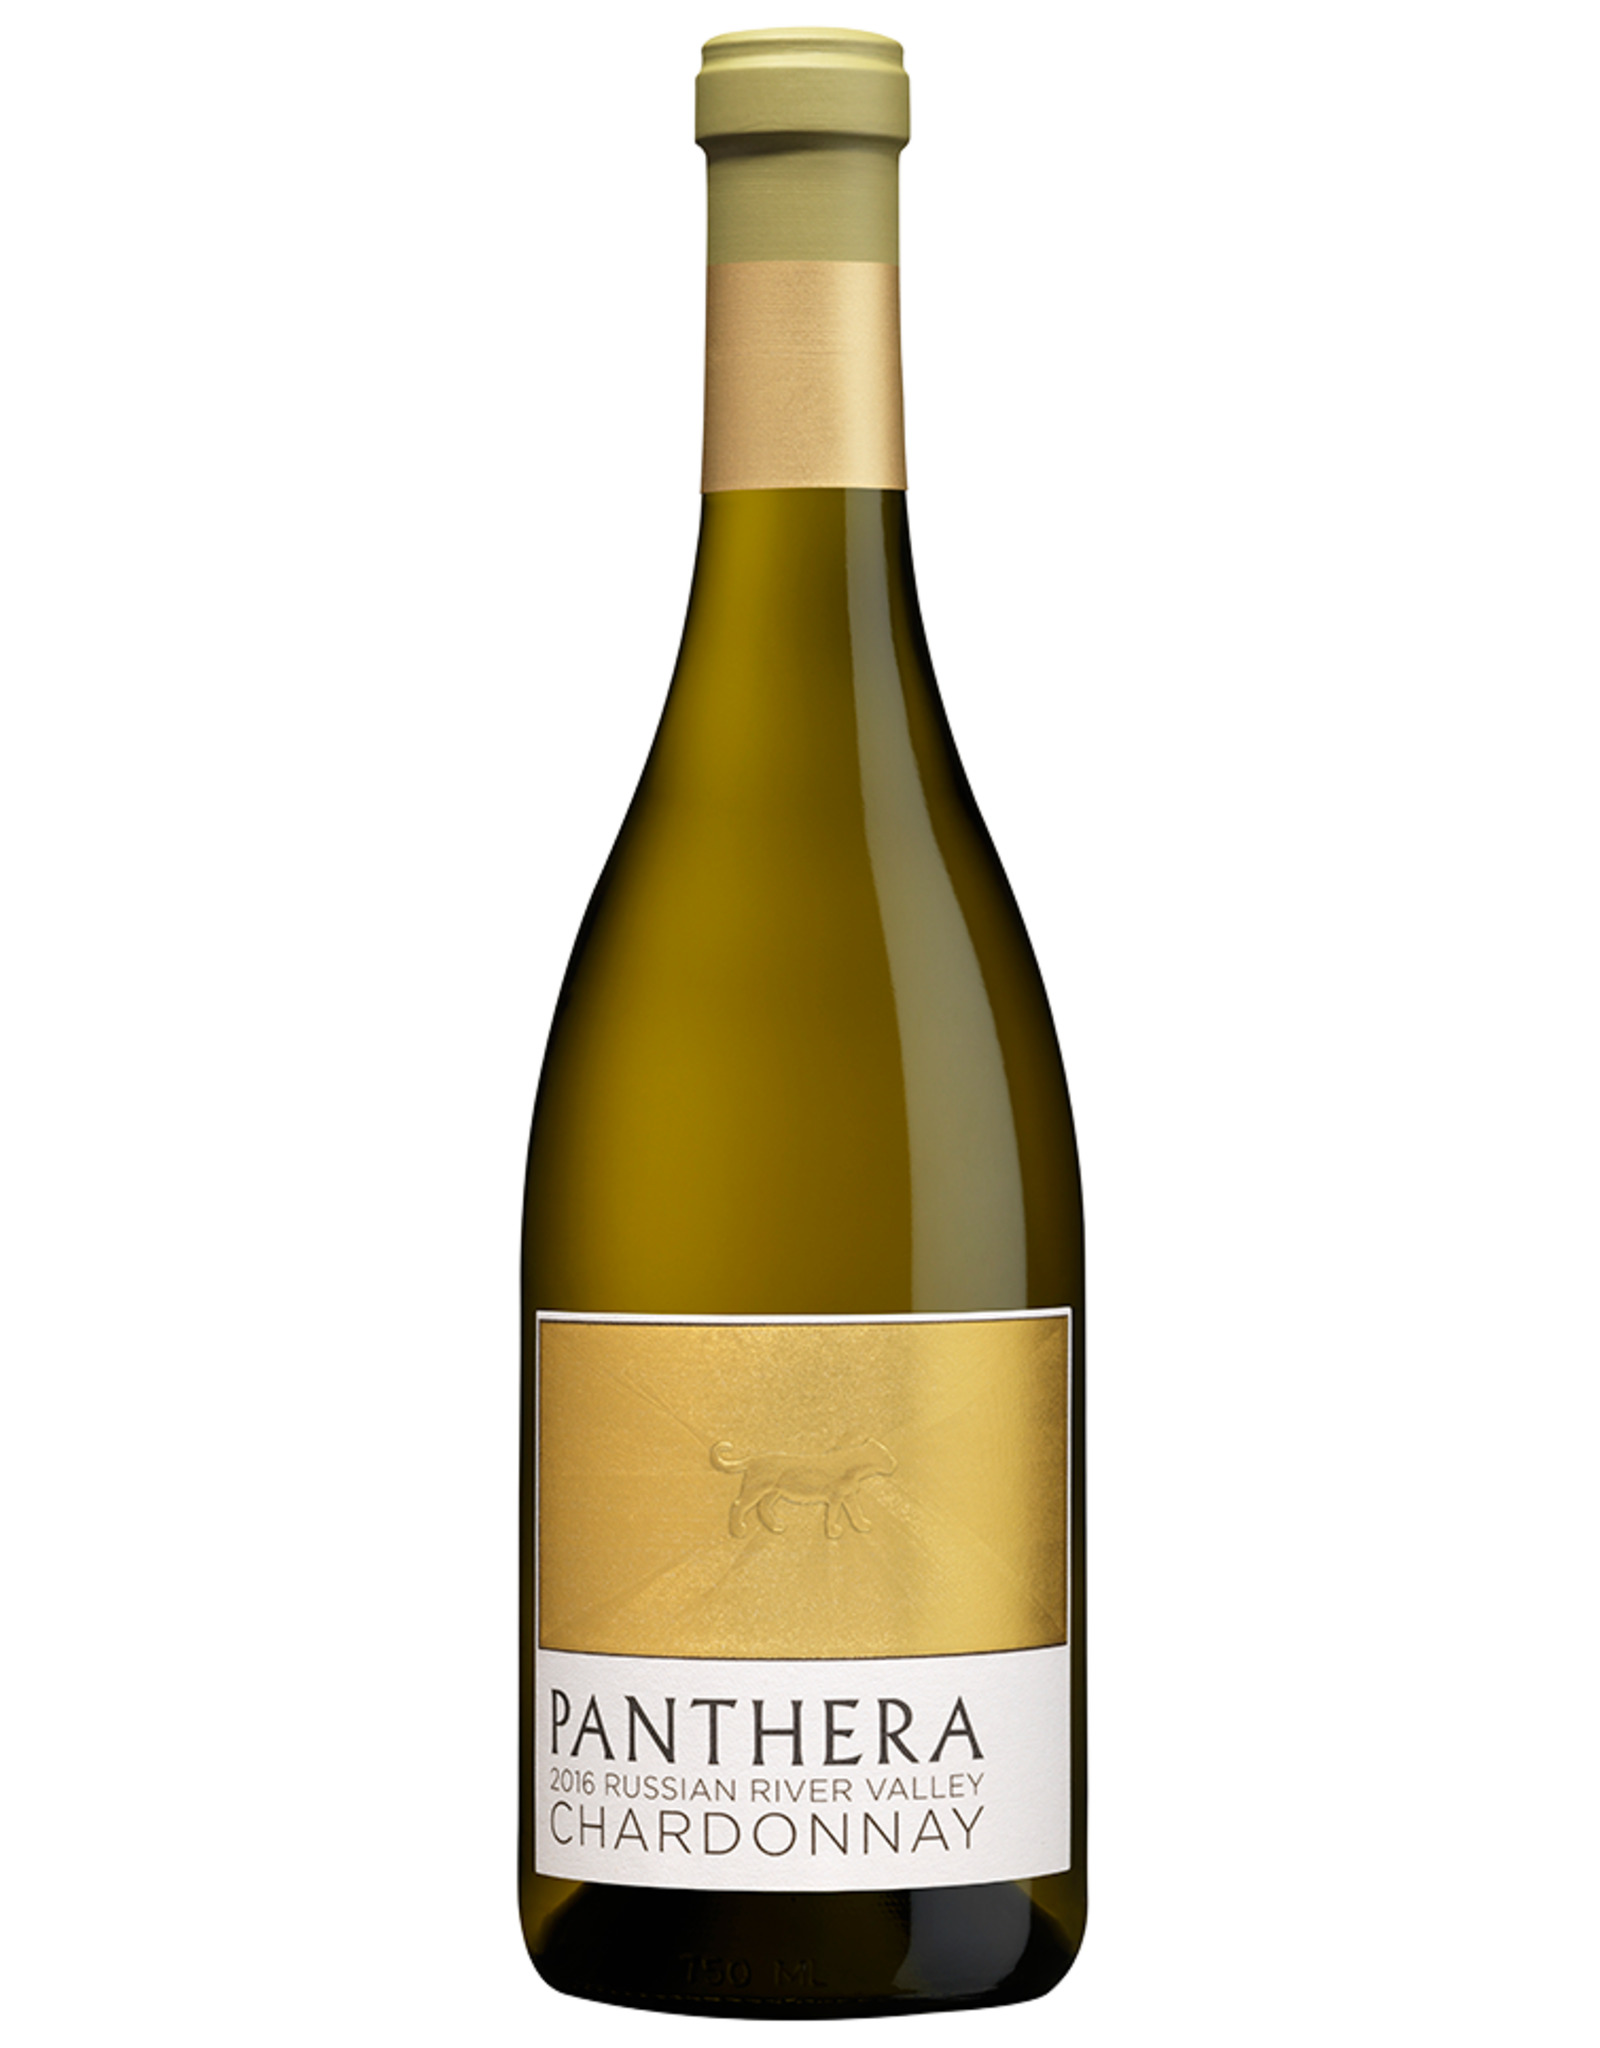 Hess Panthera Russian River Valley Chardonnay 2016